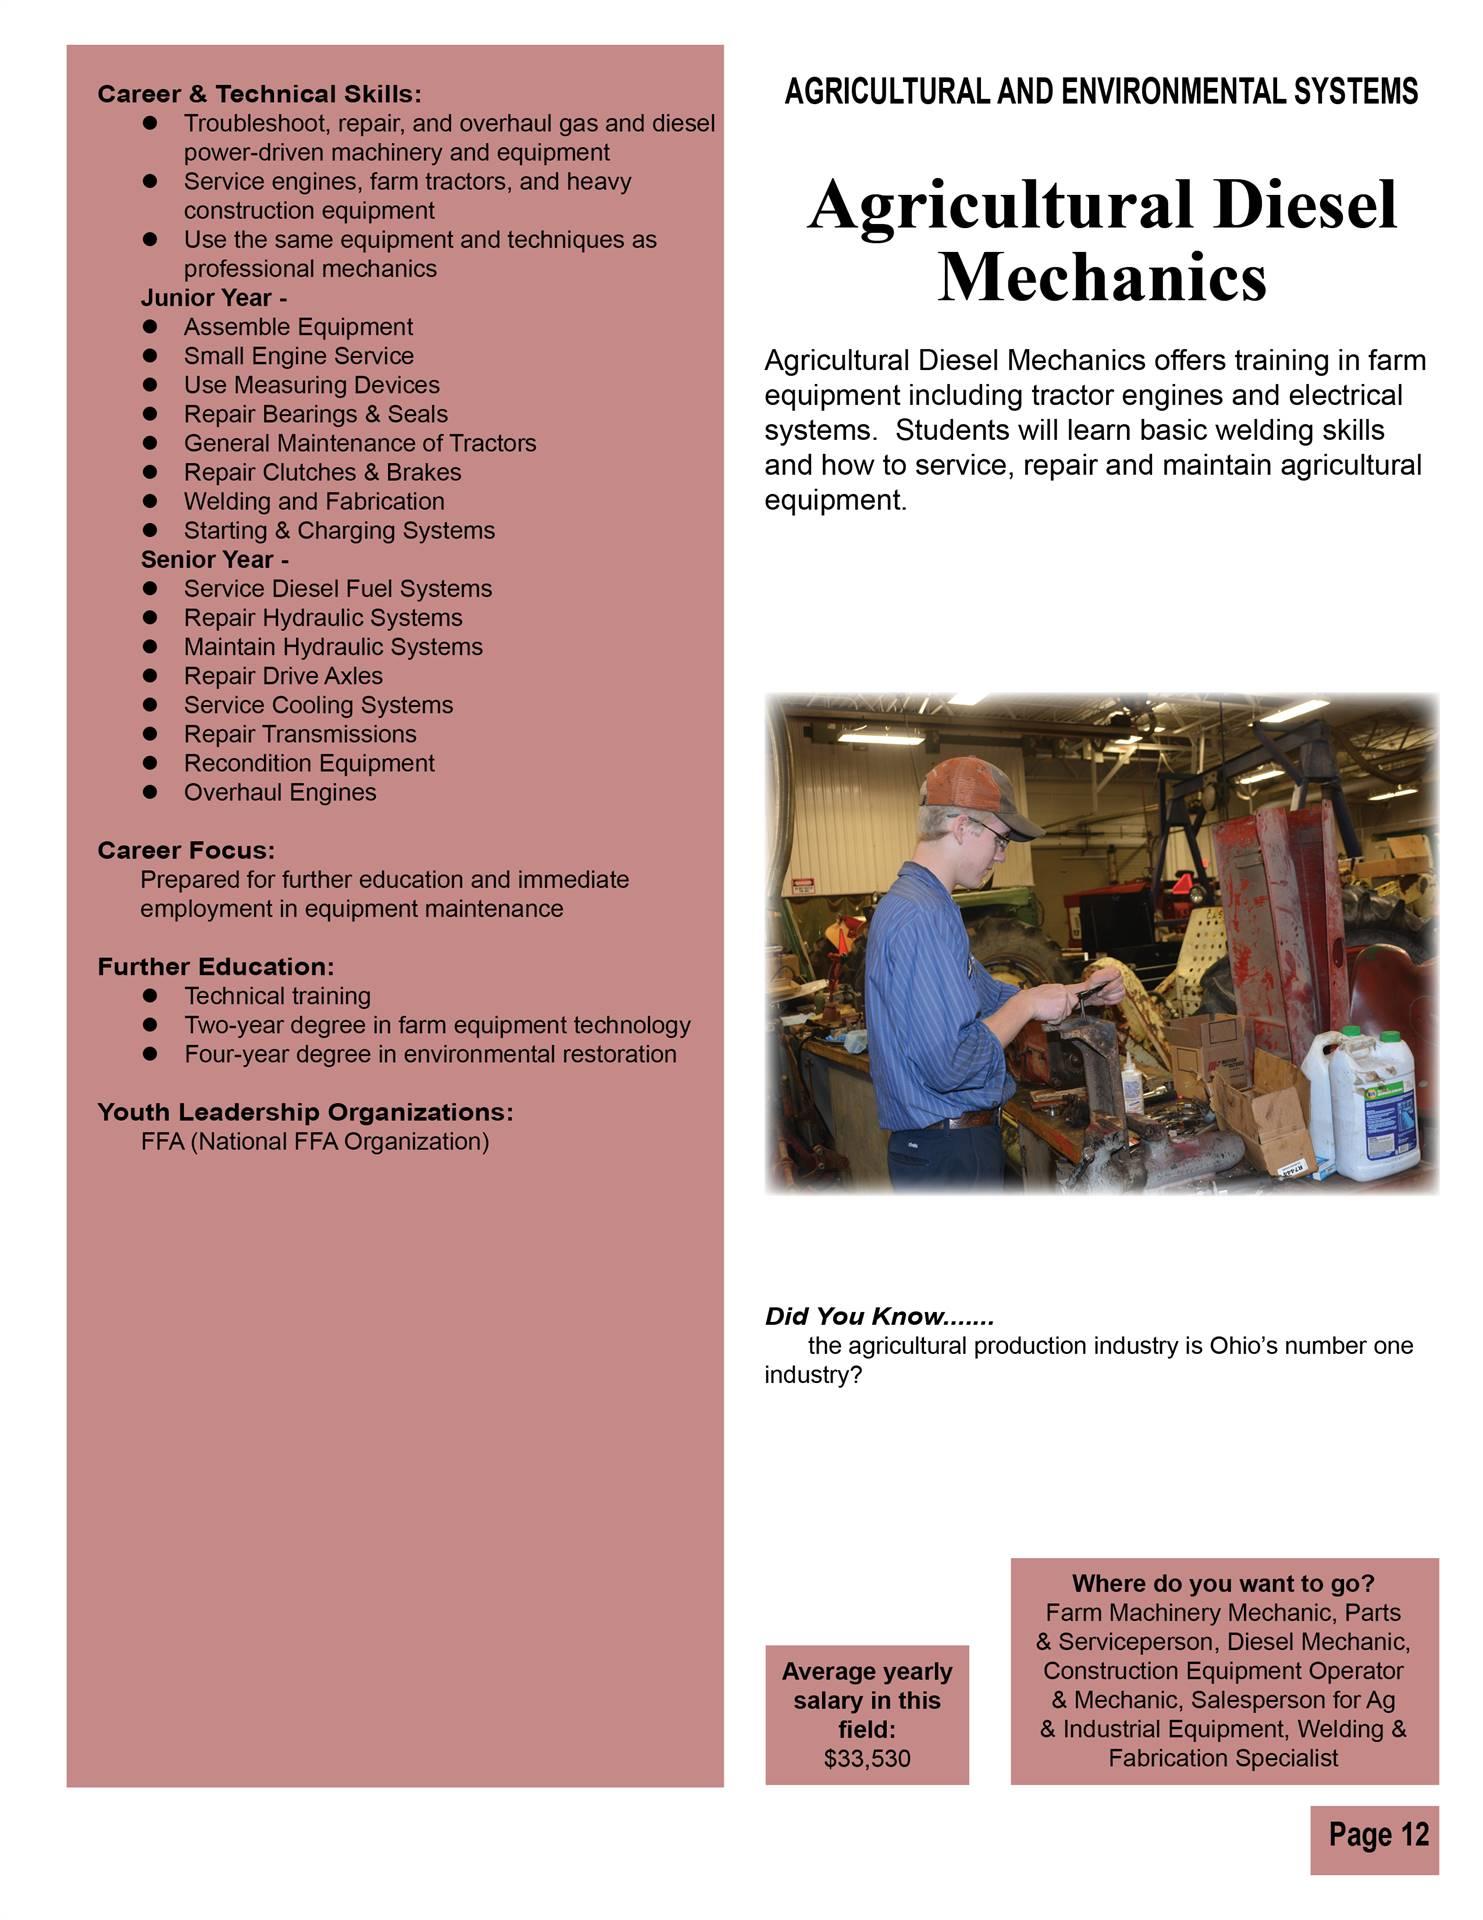 Agricultural Diesel Mechanics